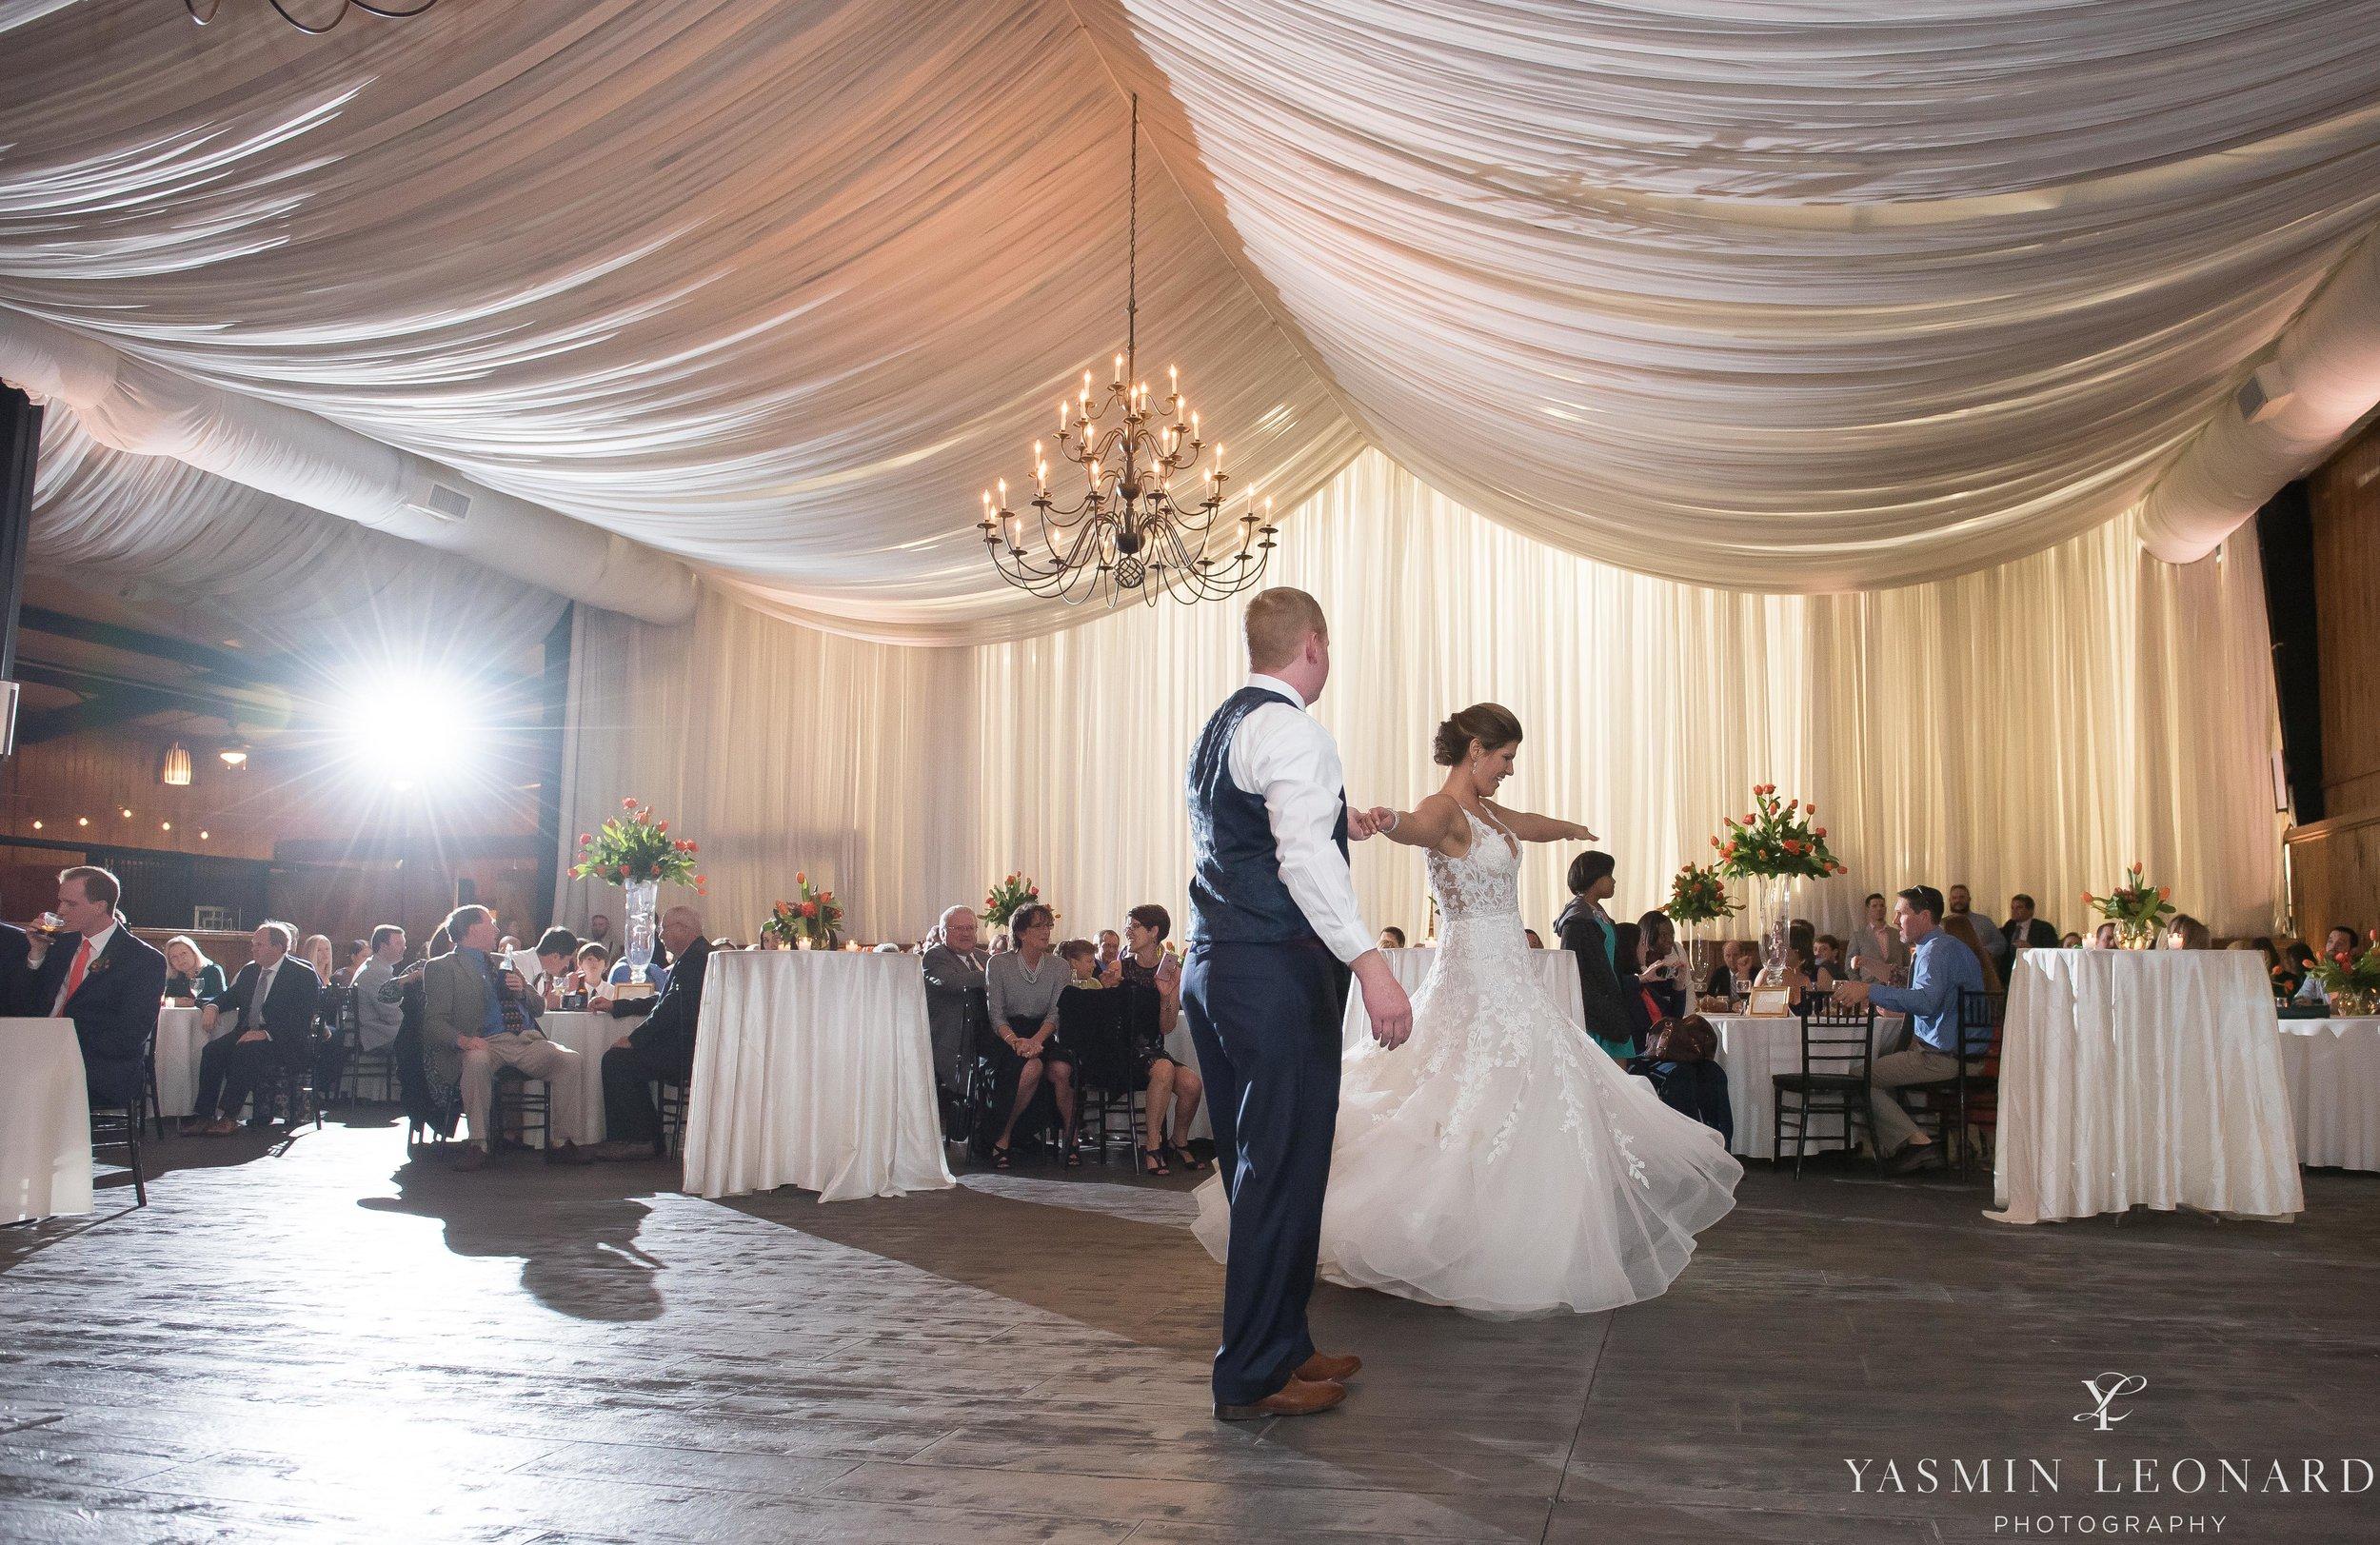 Adaumont Farm - Adaumont Farm Weddings - Trinity Weddings - NC Weddings - Yasmin Leonard Photography-61.jpg